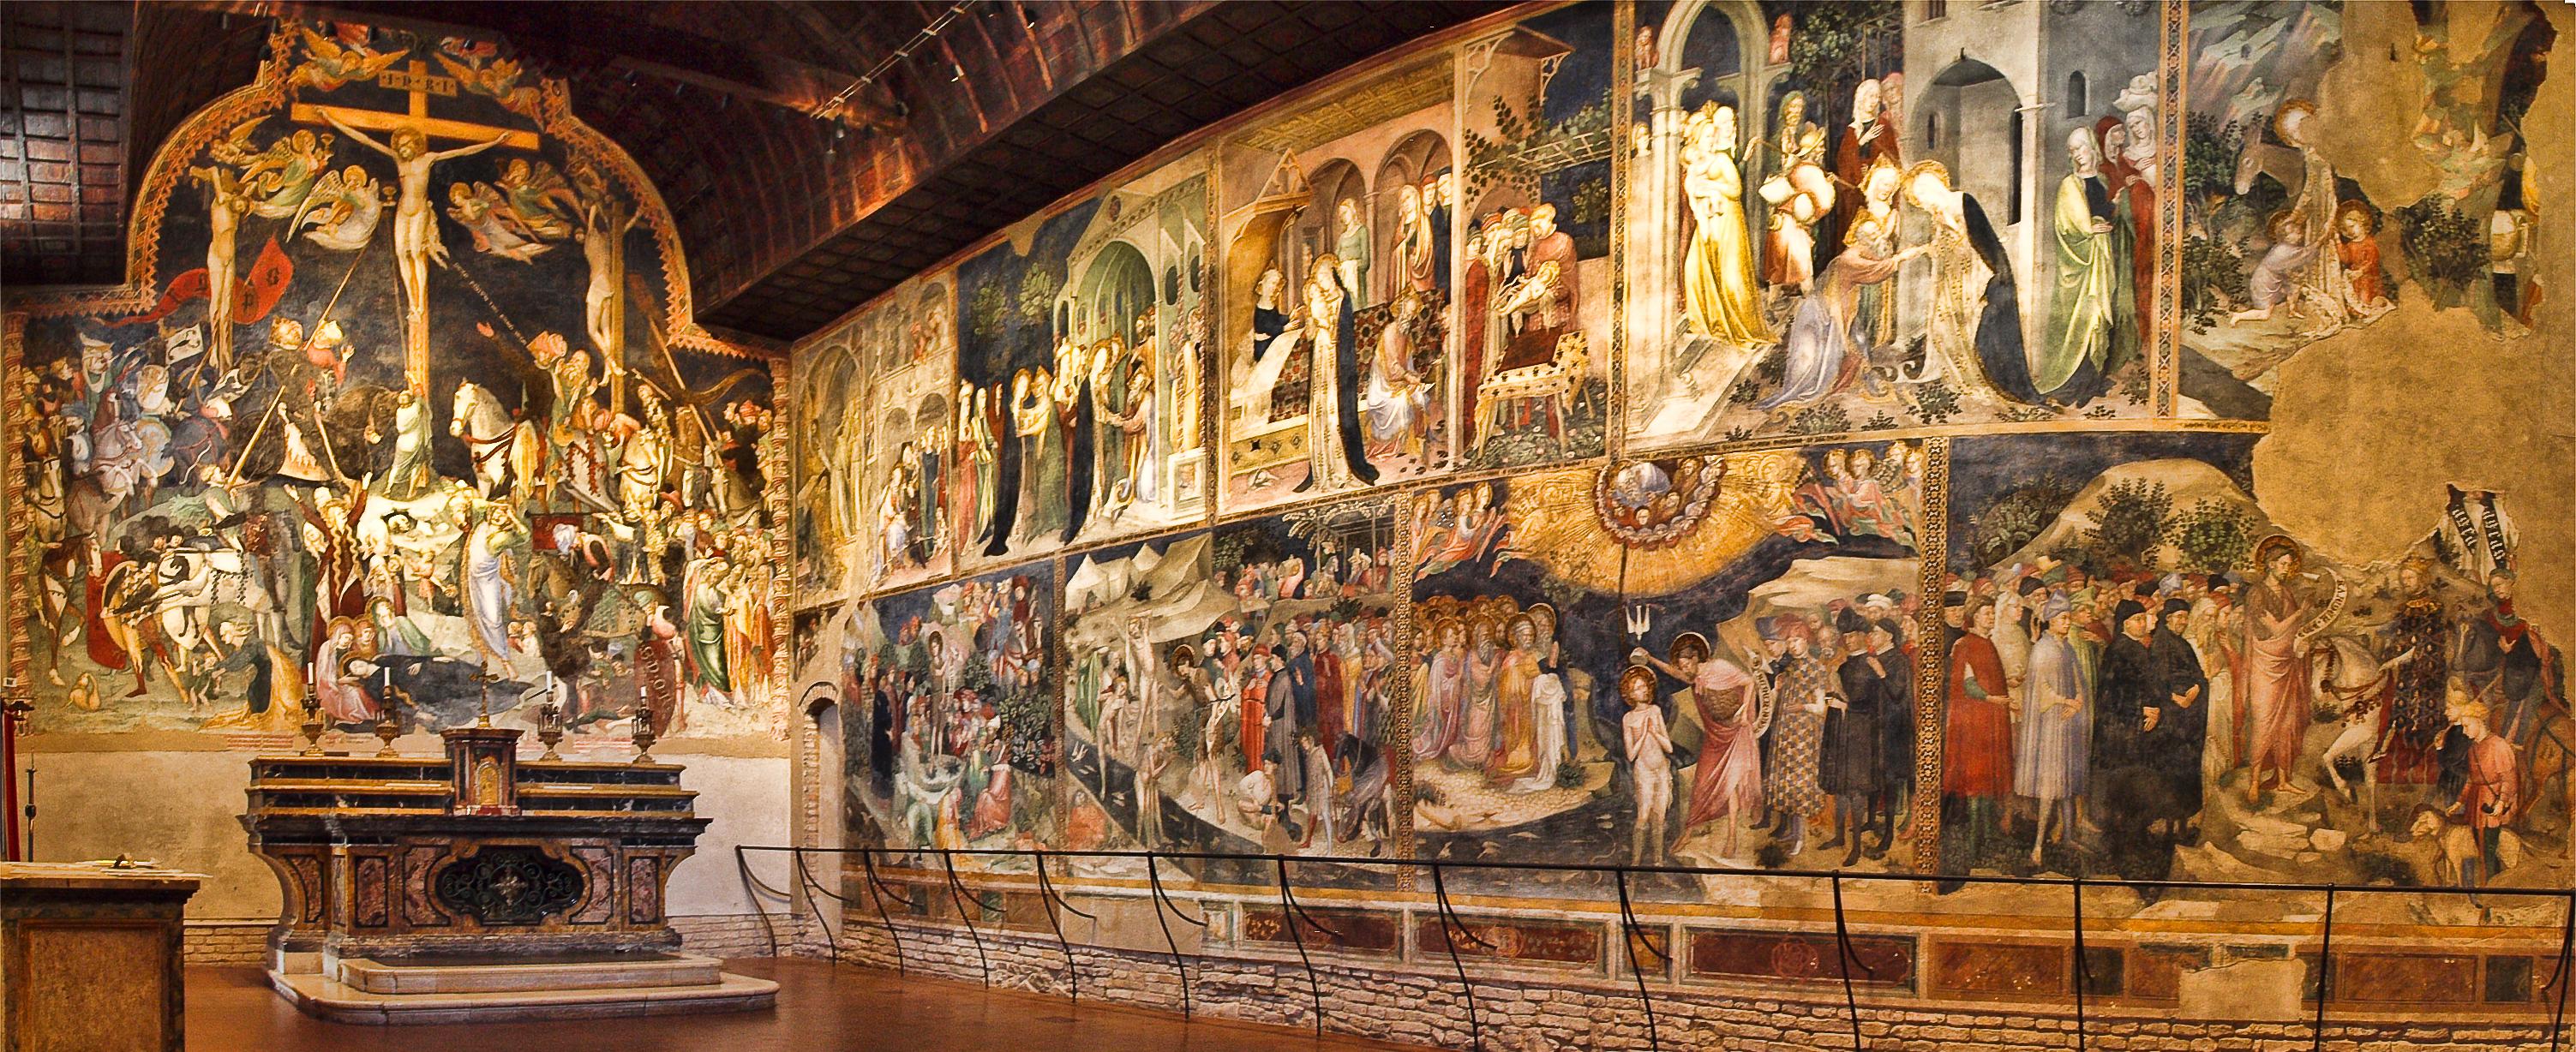 Urbino Italy Pictures Painting in Urbino Italy